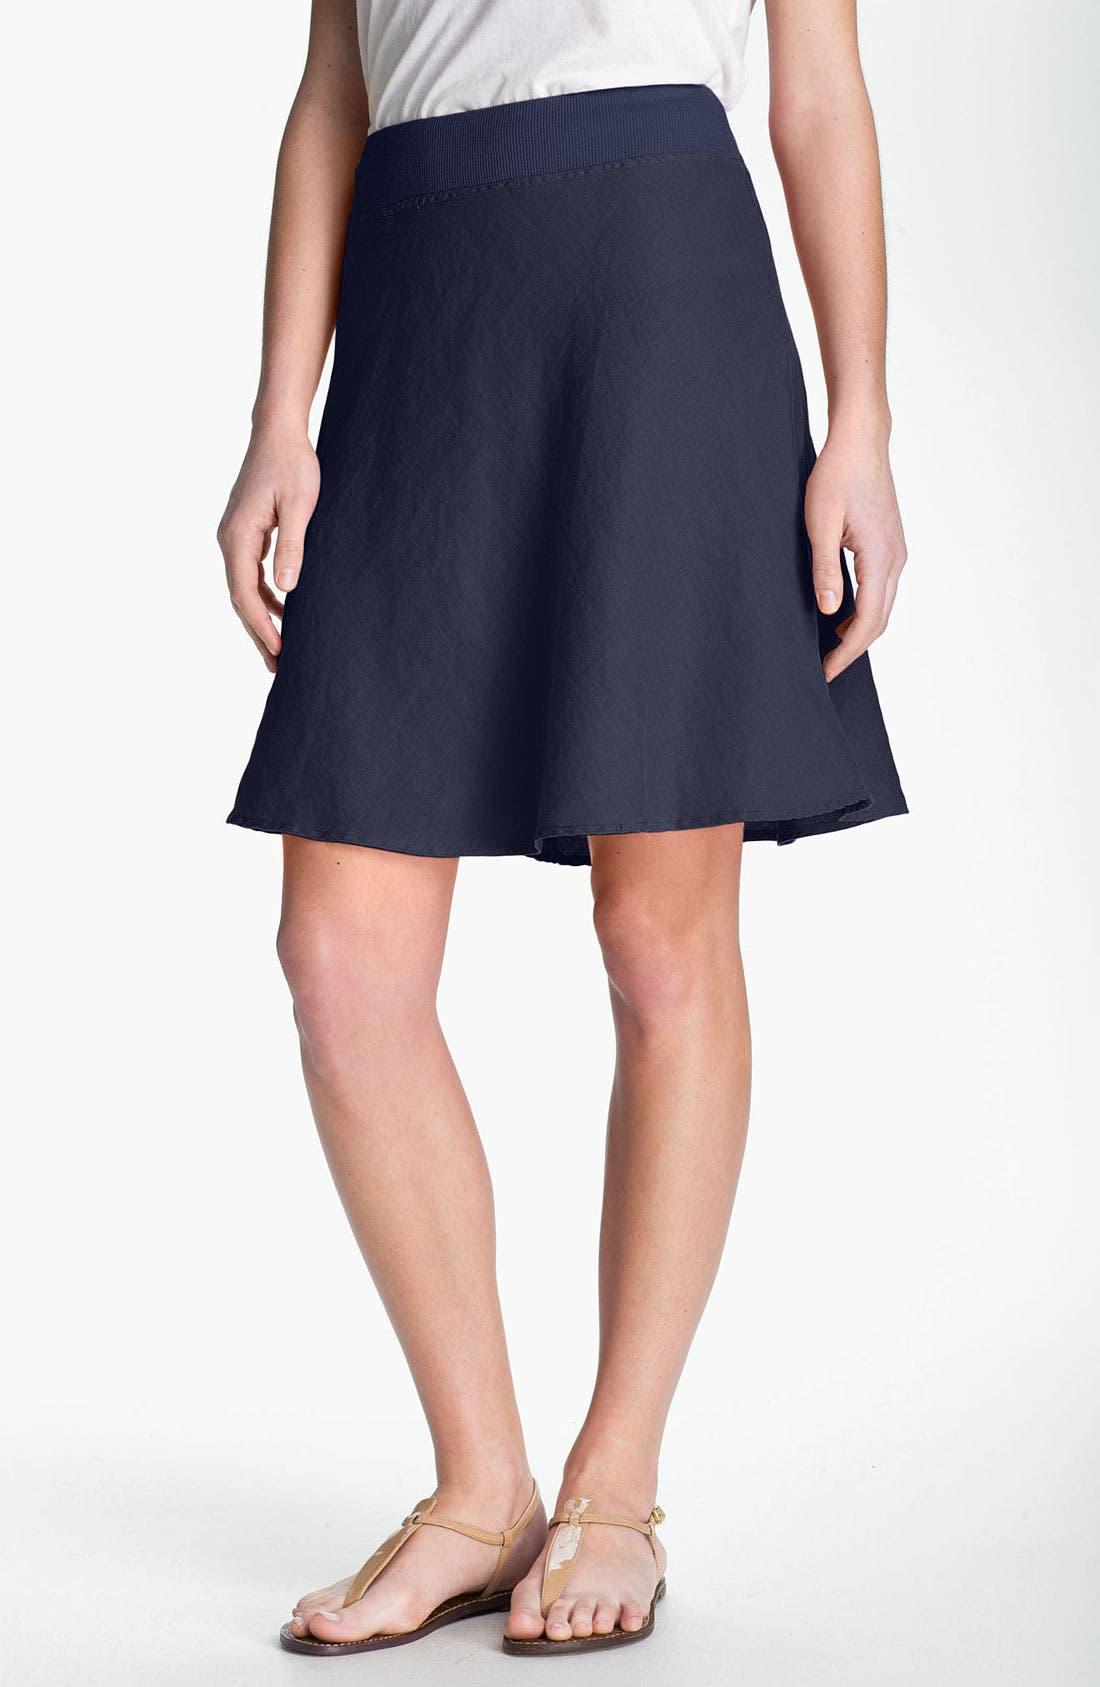 Alternate Image 1 Selected - Allen Allen A-Line Linen Skirt